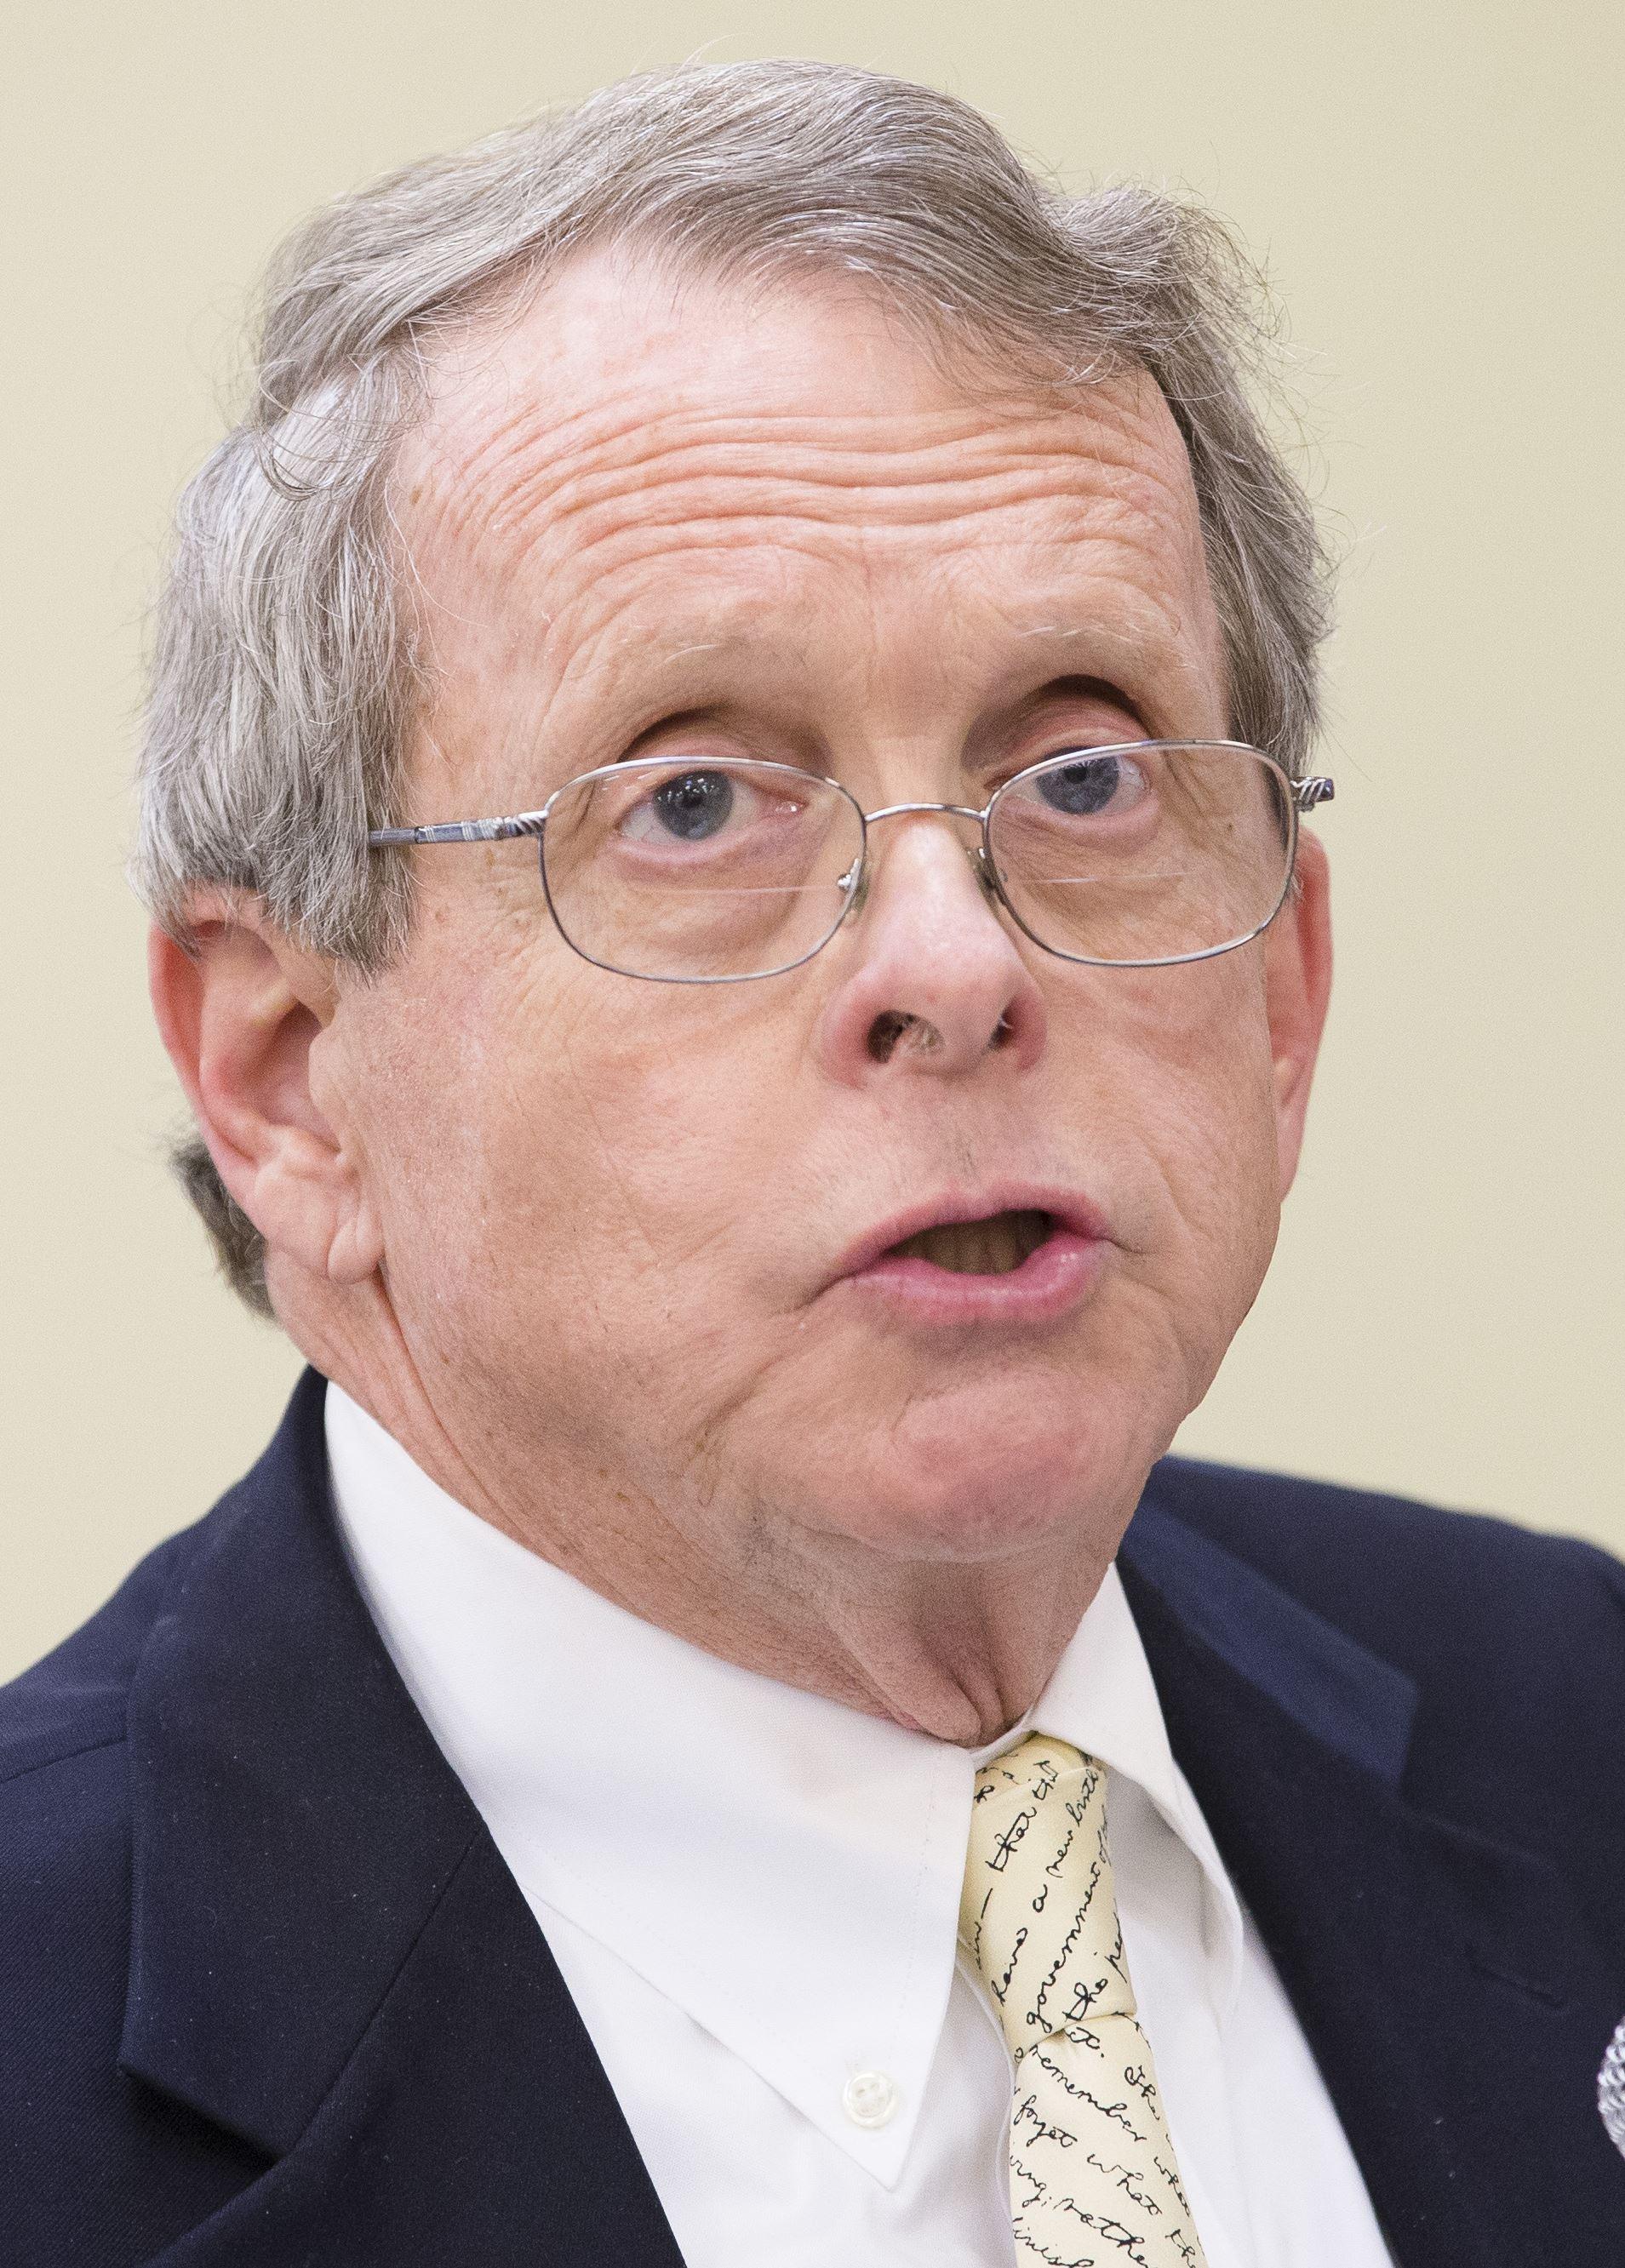 ohio attorney general dewine sues 5 drugmakers over opiate crisis